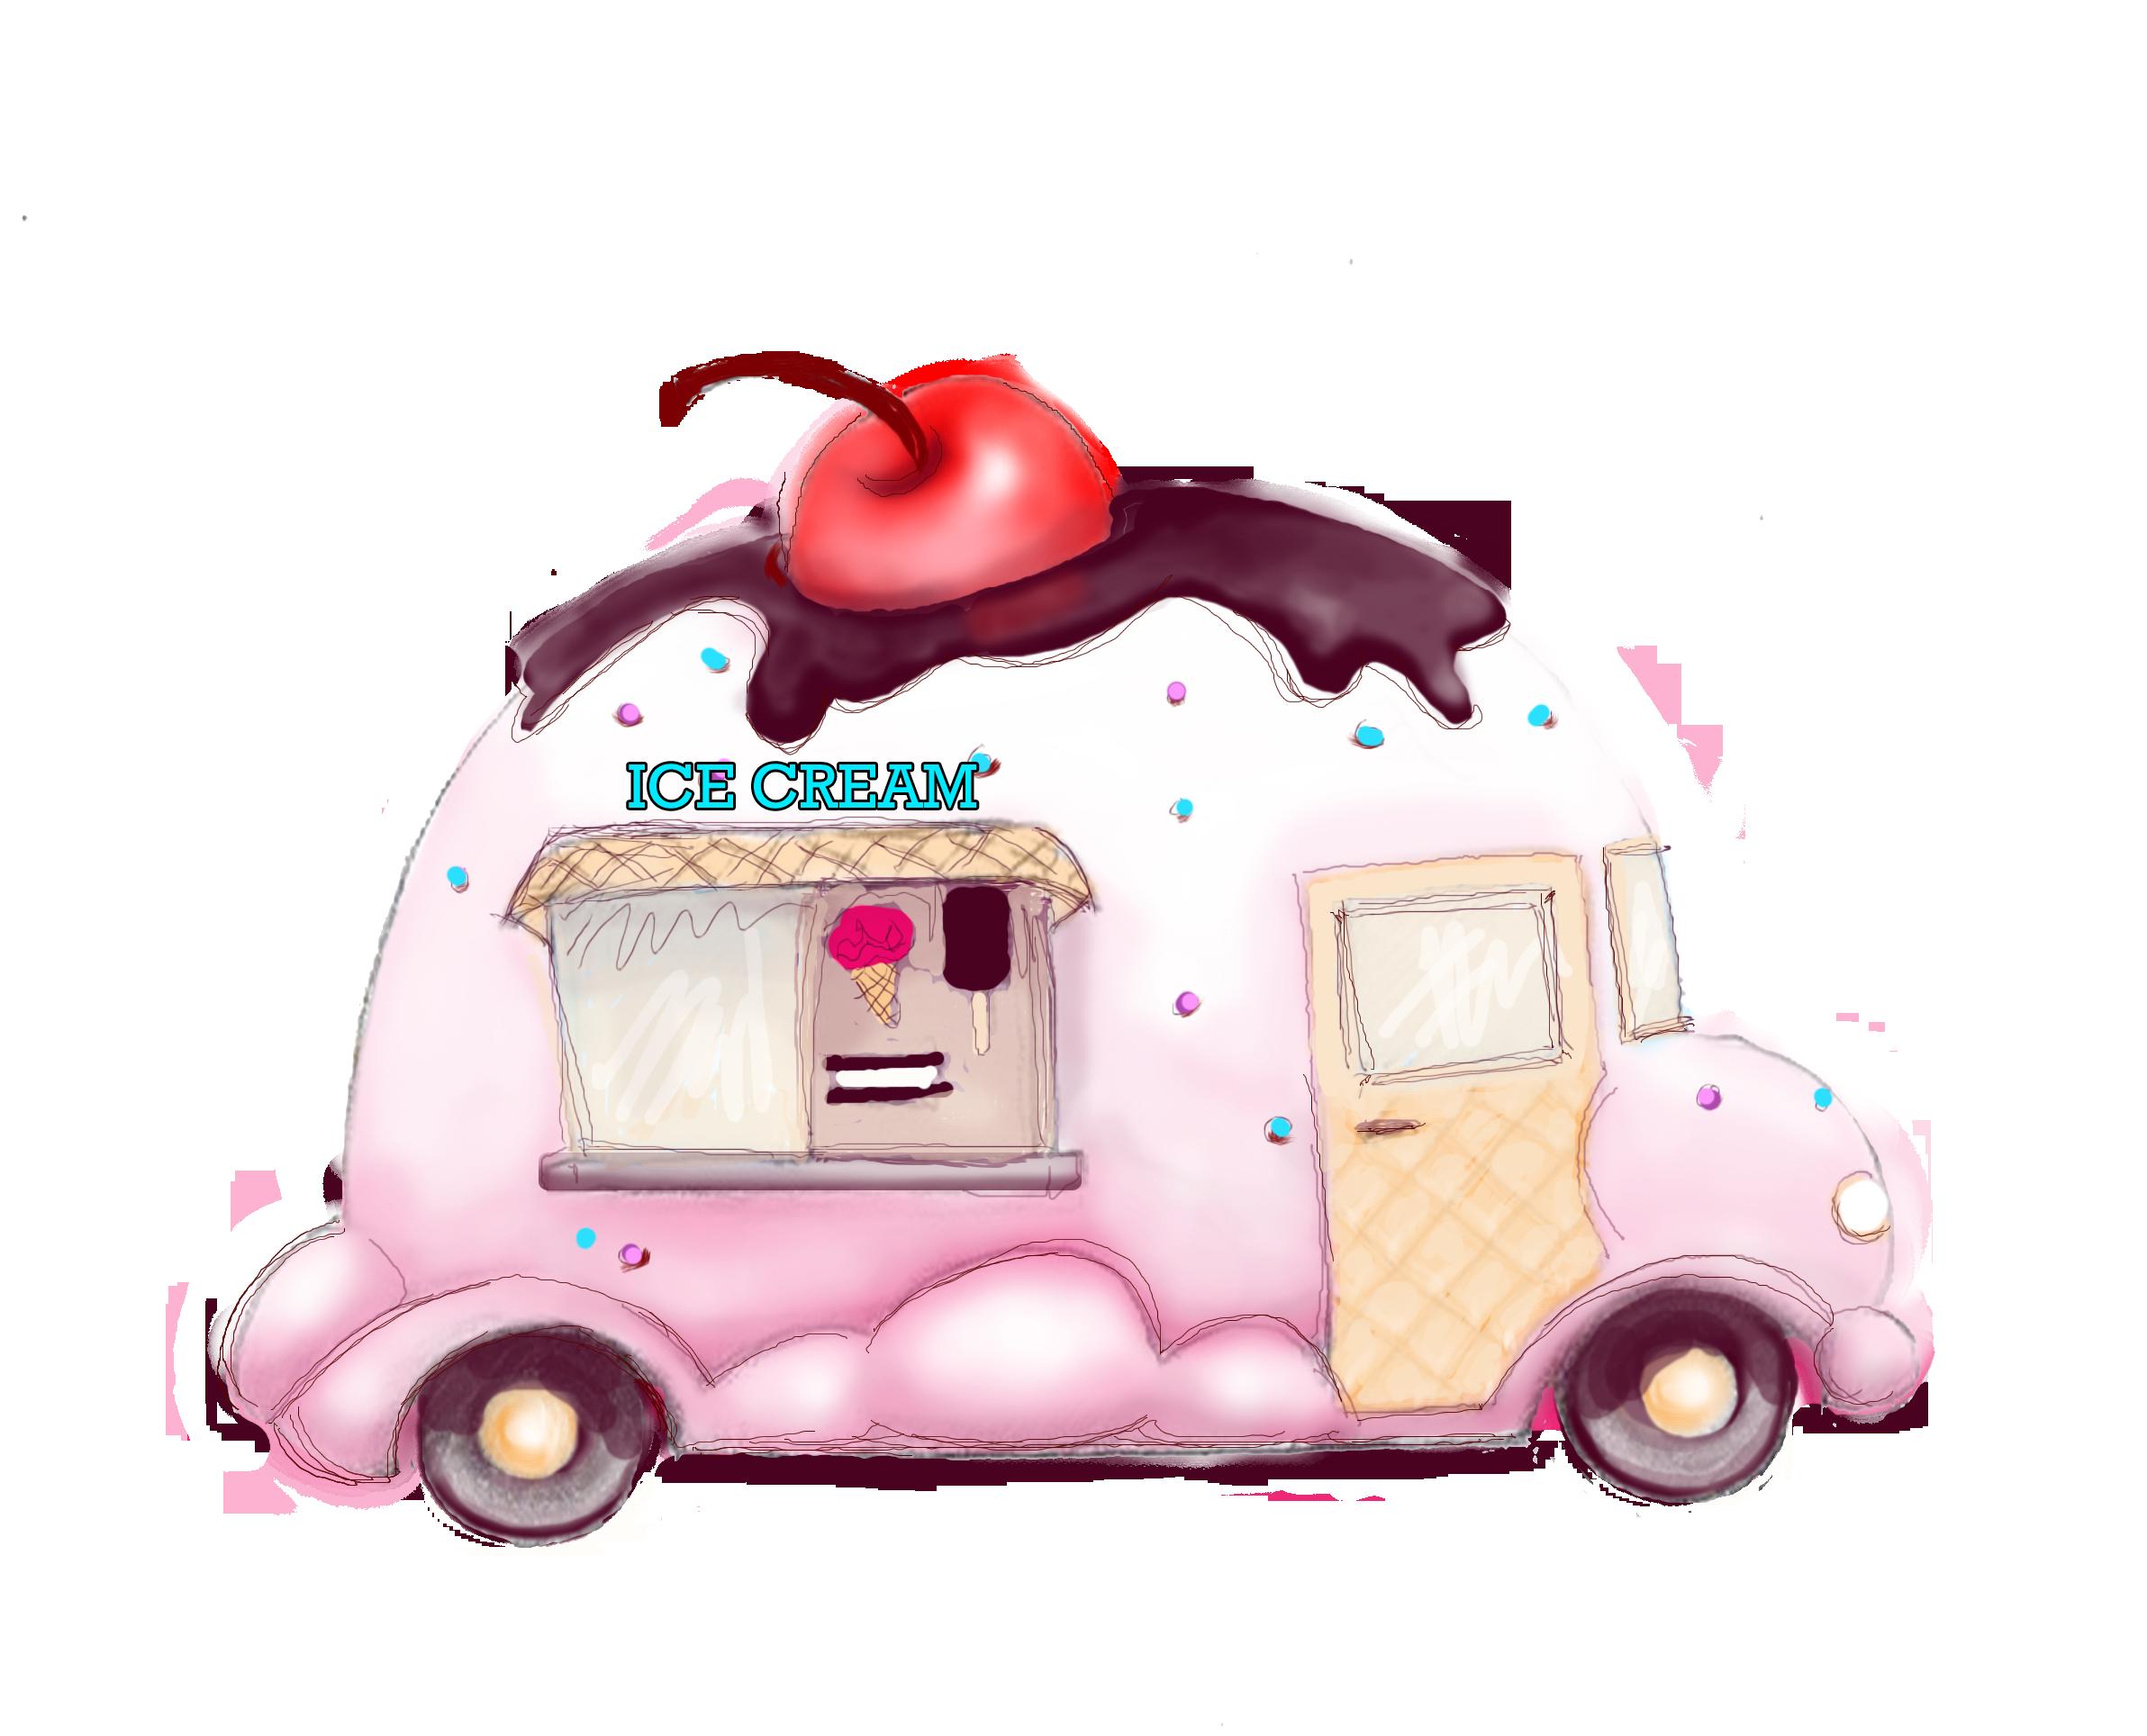 Ice Cream art.